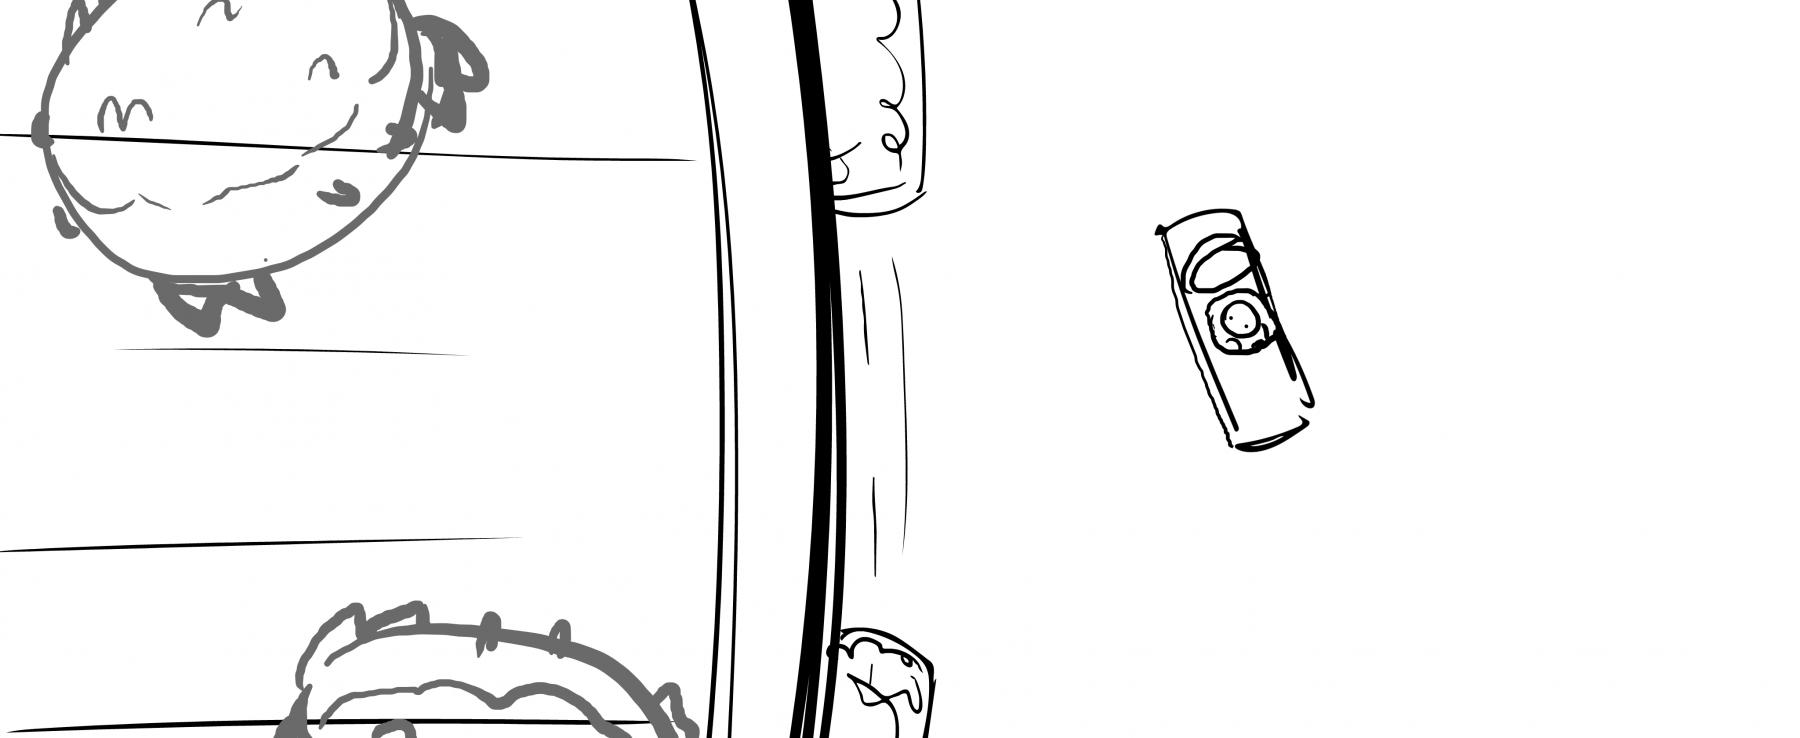 Nut-Thumbnail-Rough-Board00335